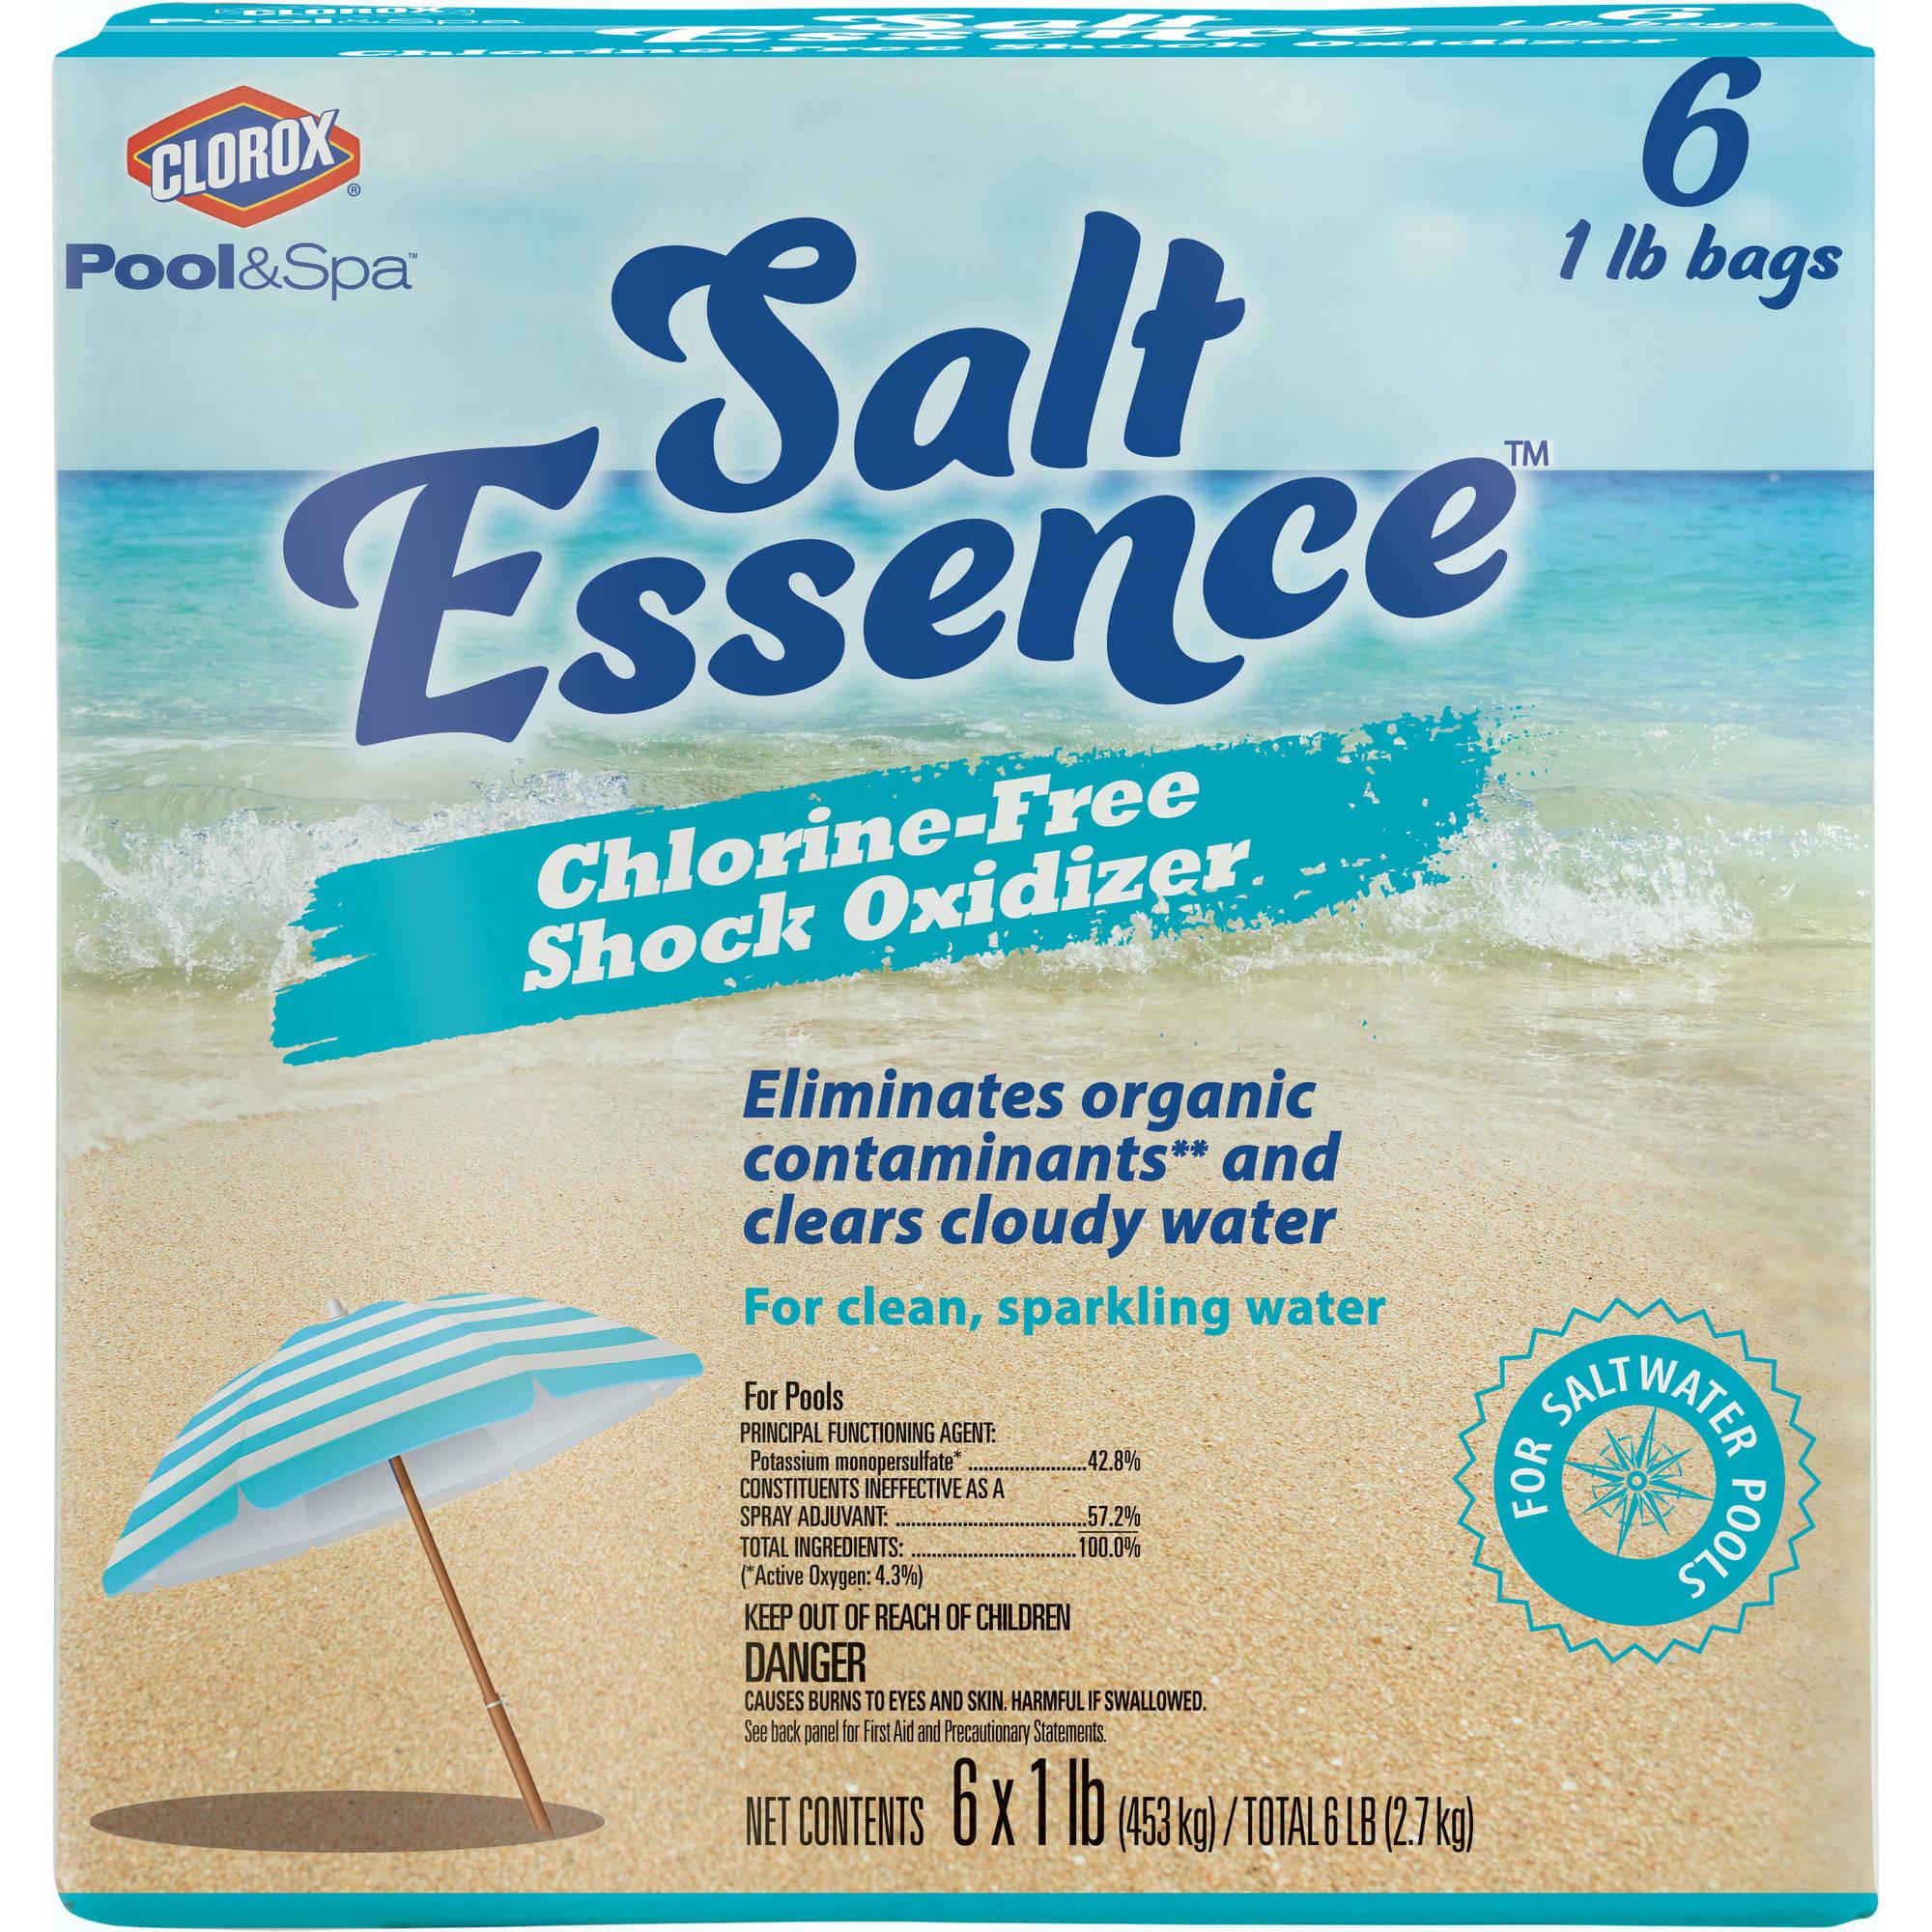 Clorox Pool&Spa Salt Essence 6-Pack 1 lb Salt Pool Chlorine Free Shock